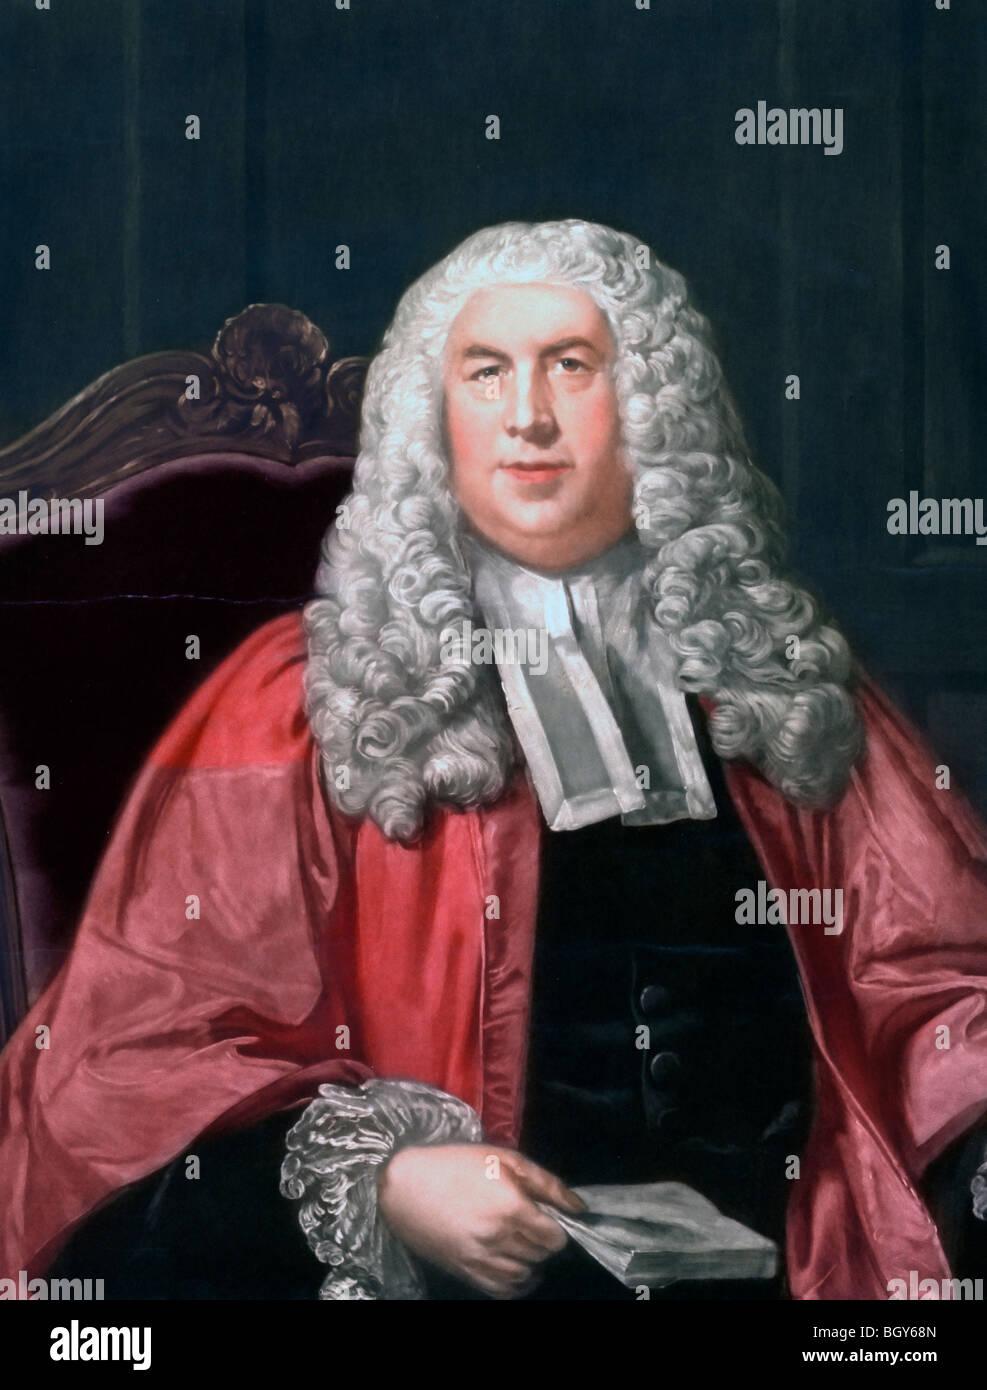 Sir William Blackstone (1723-1780), English Jurist, half-length portrait, seated, facing slightly left - Stock Image